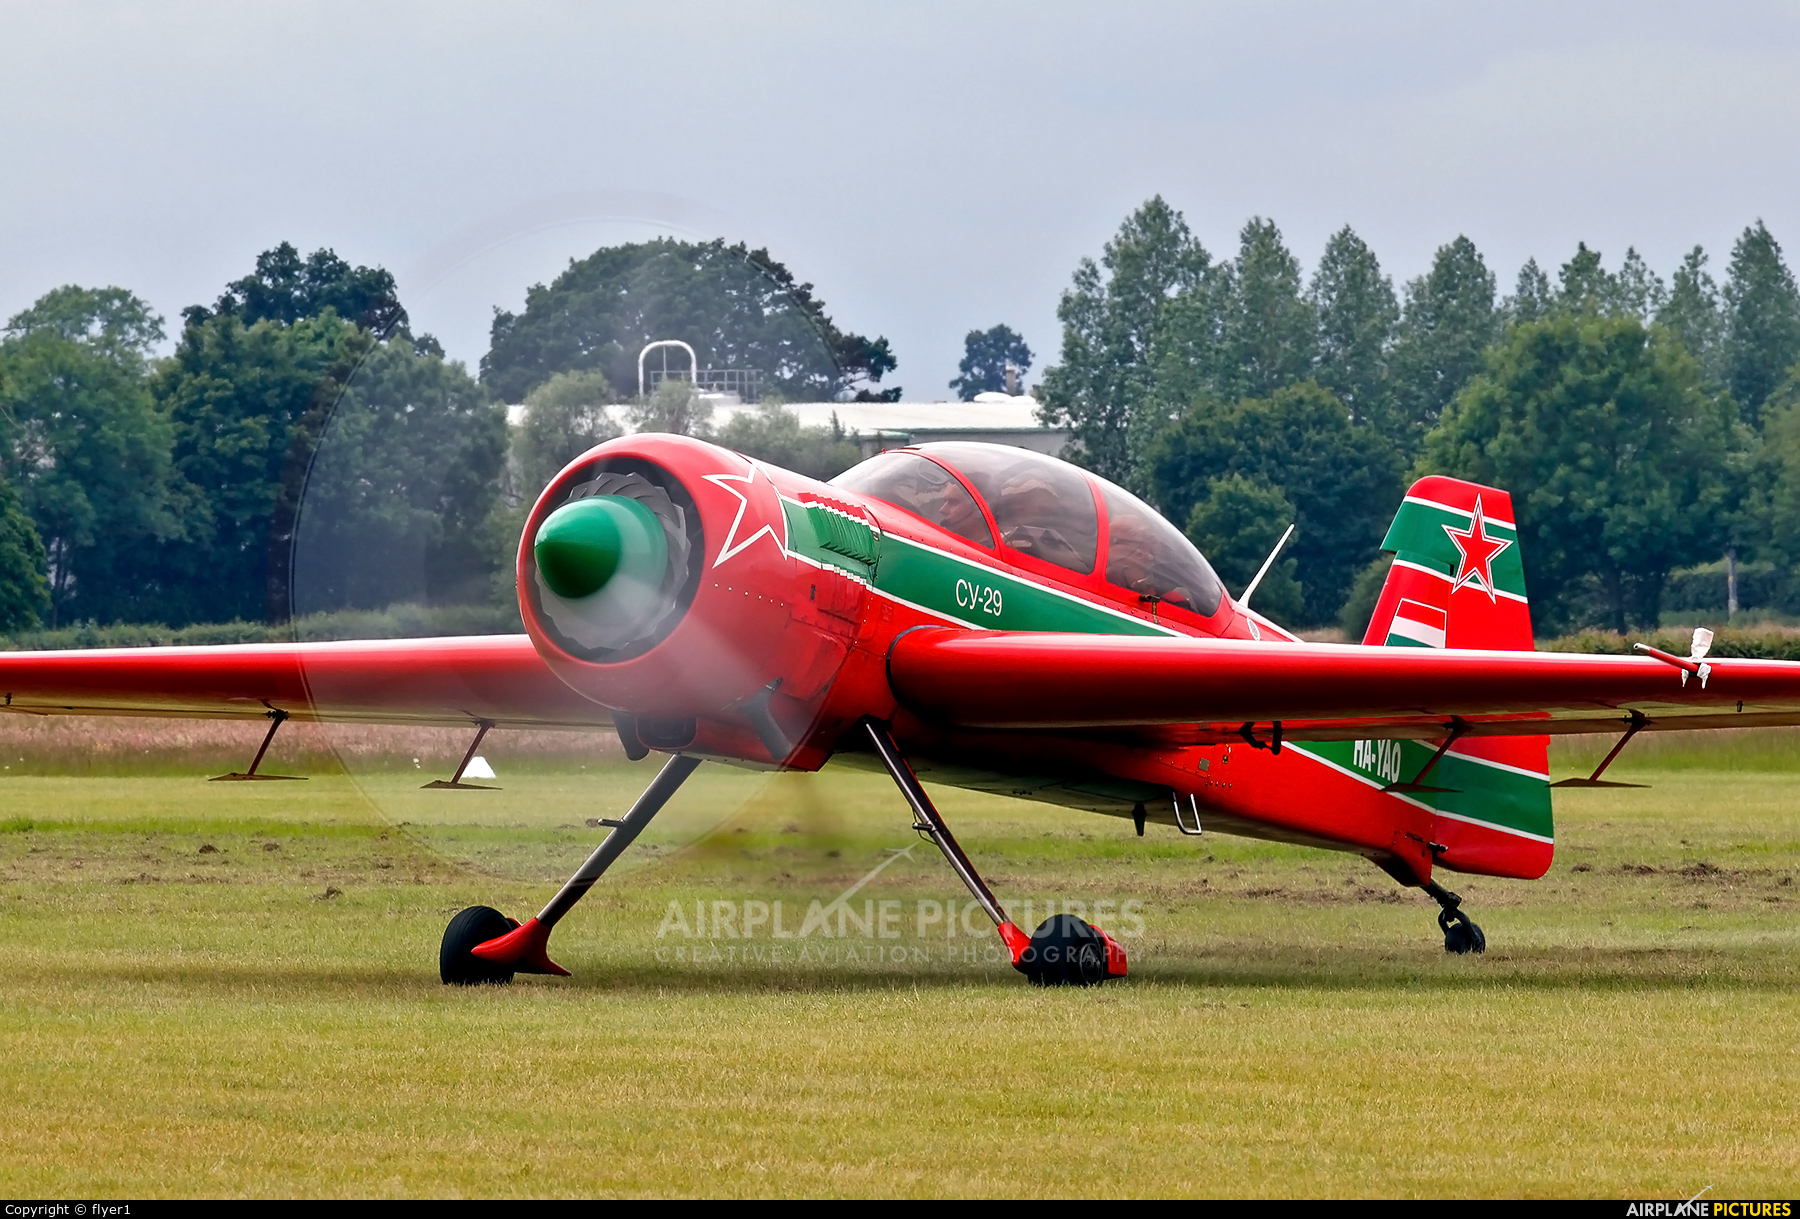 Private HA-YAO aircraft at Lashenden / Headcorn